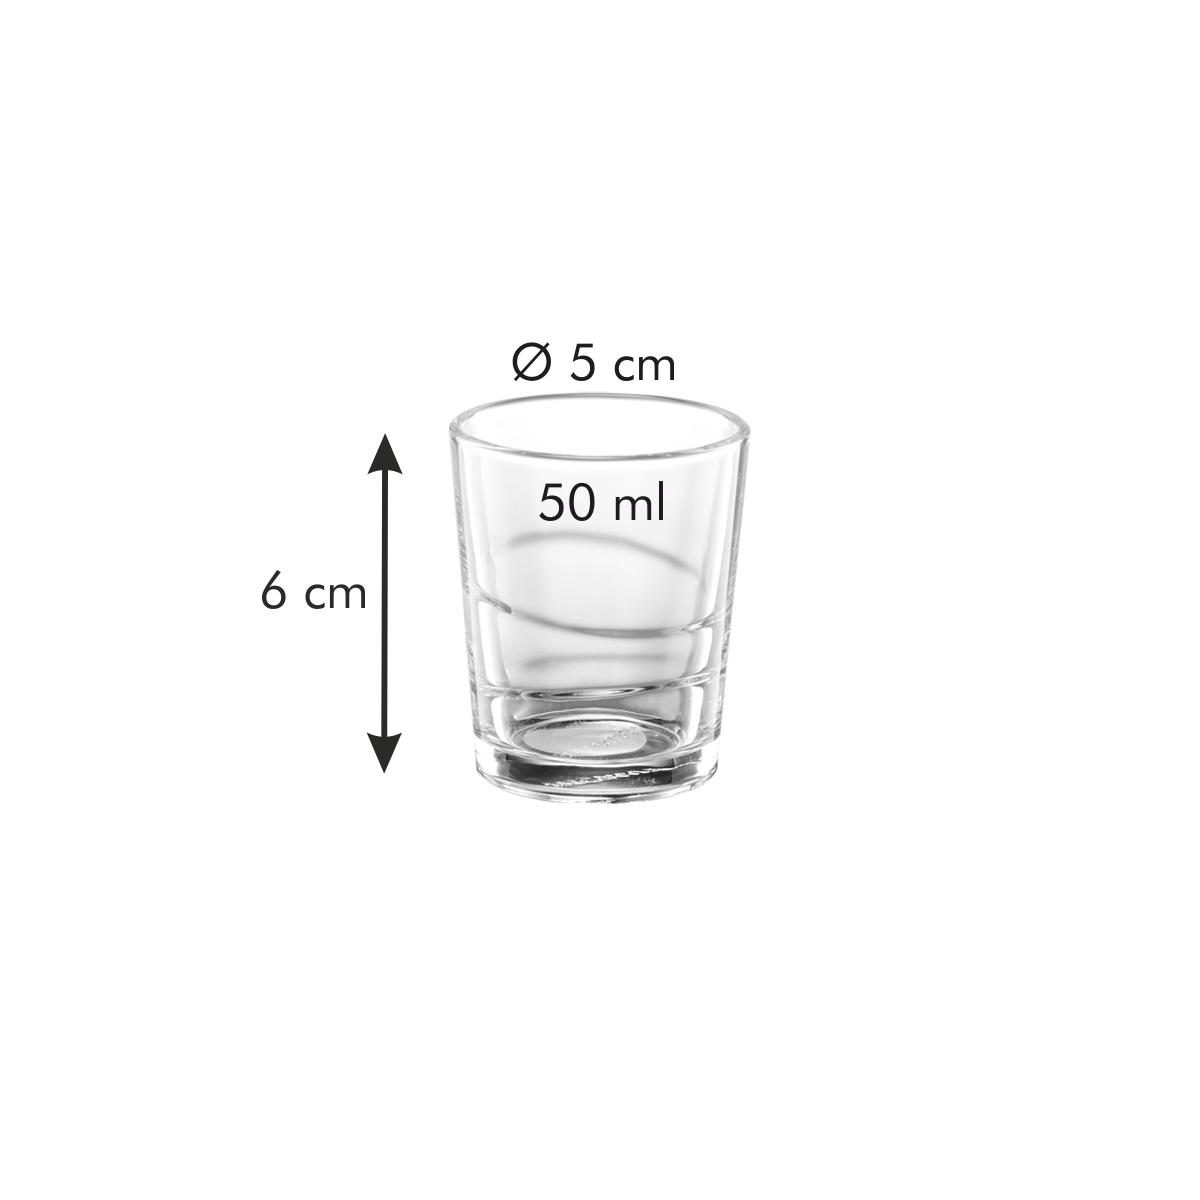 Panák myDRINK 50 ml, 6 ks